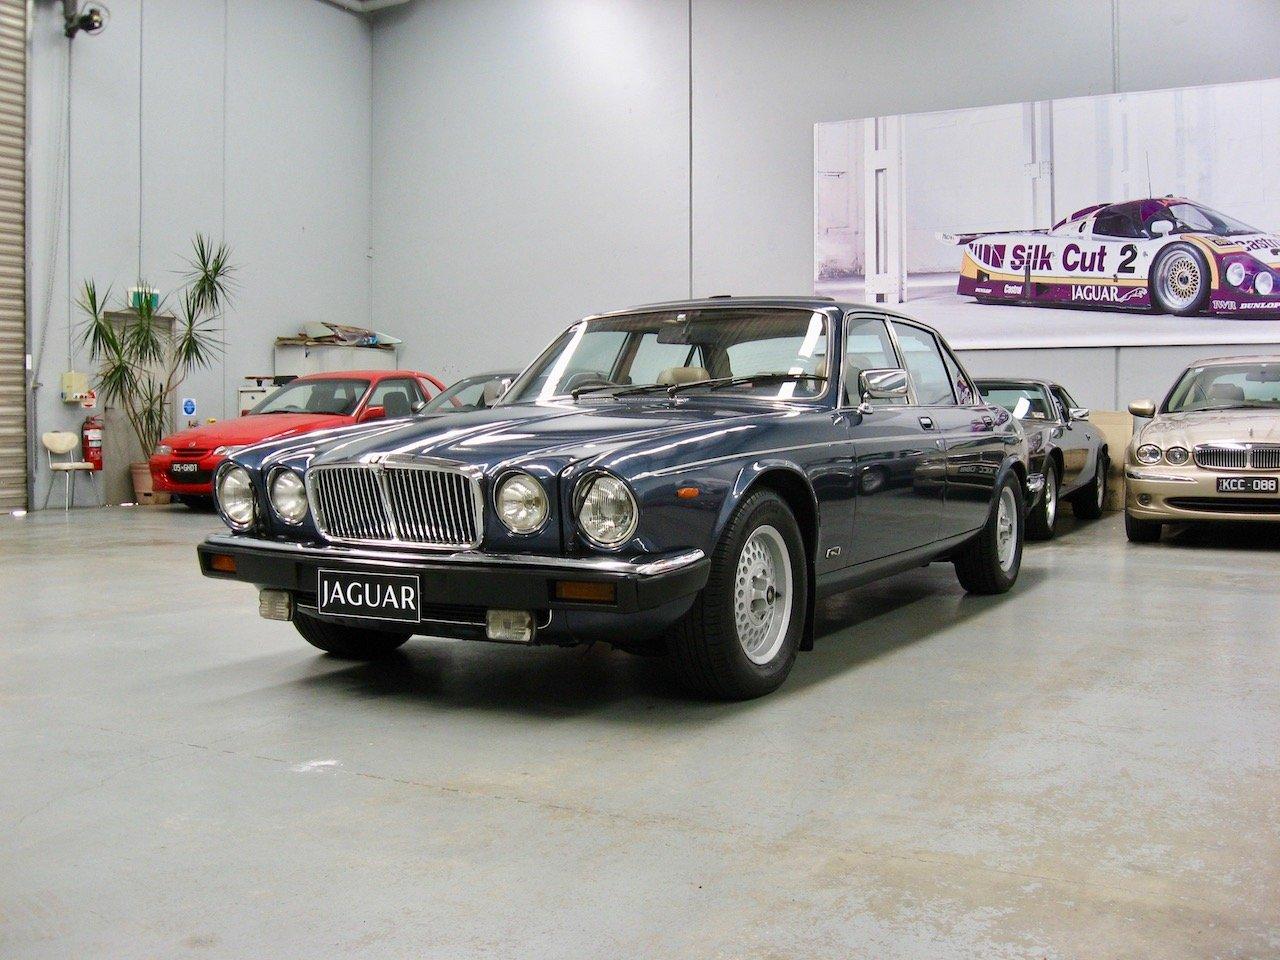 1987 Jaguar XJ12 Series 3 Sovereign V12 For Sale (picture 2 of 6)